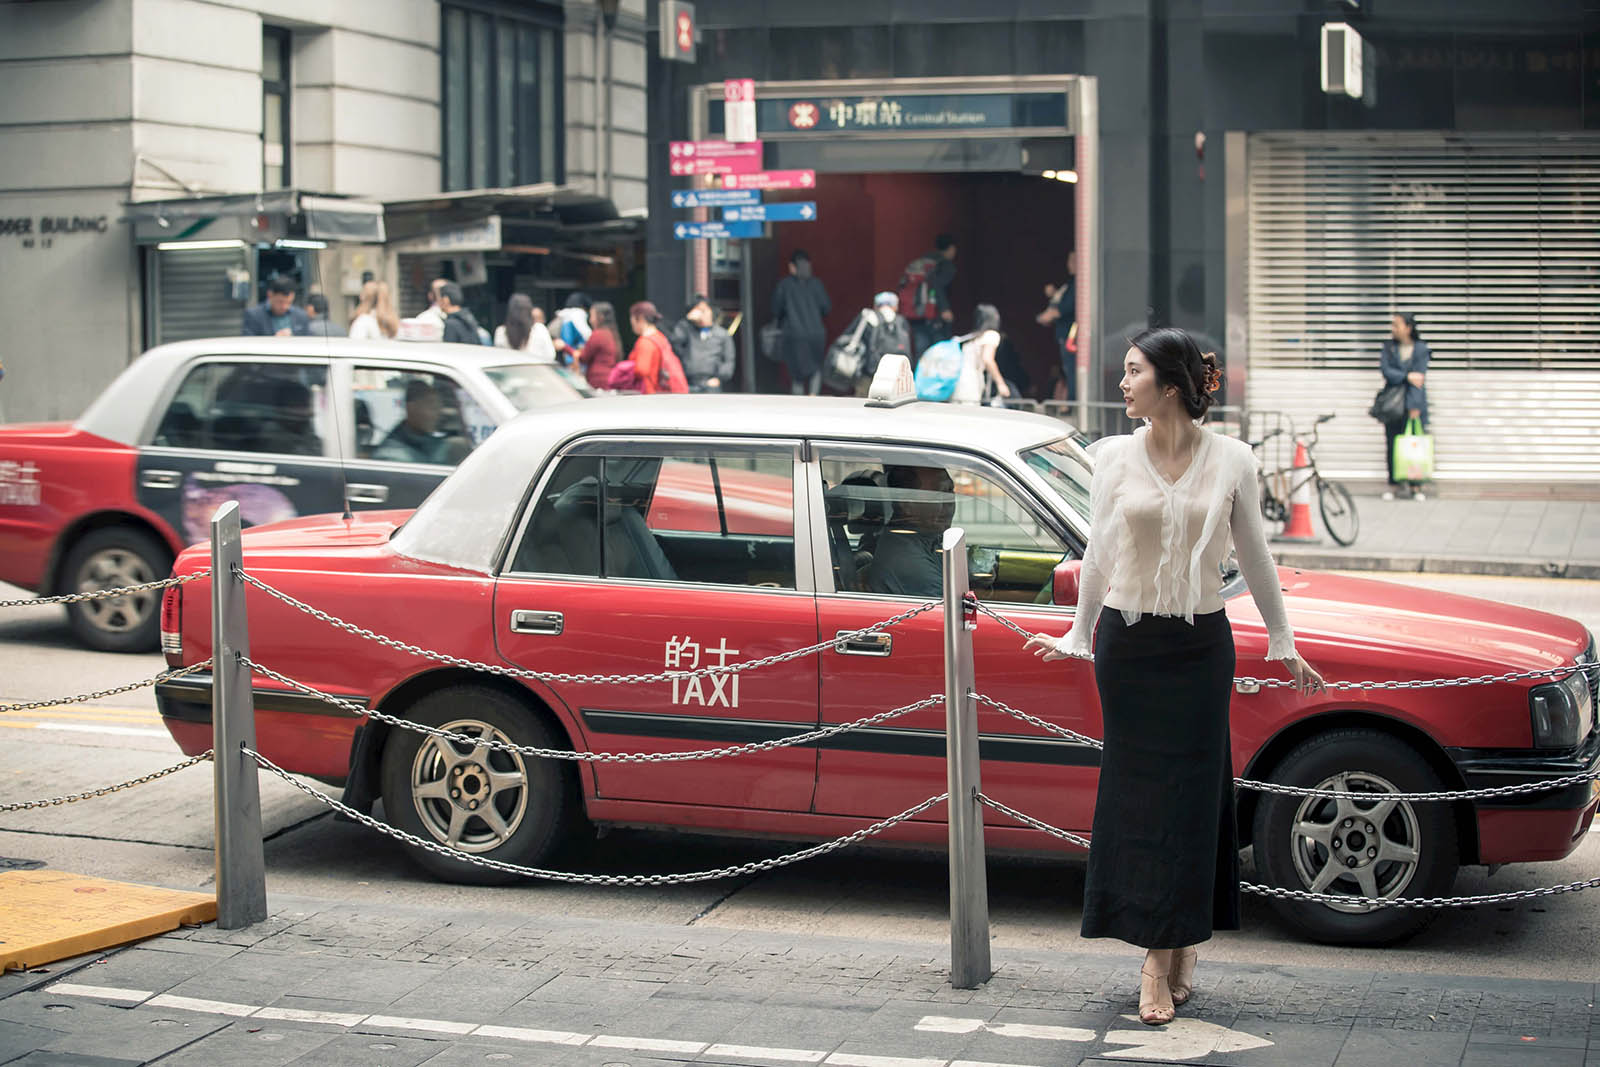 Sprazzi_Professional_Portrait_Photo_Hongkong_Kevin_Resize_4.jpg